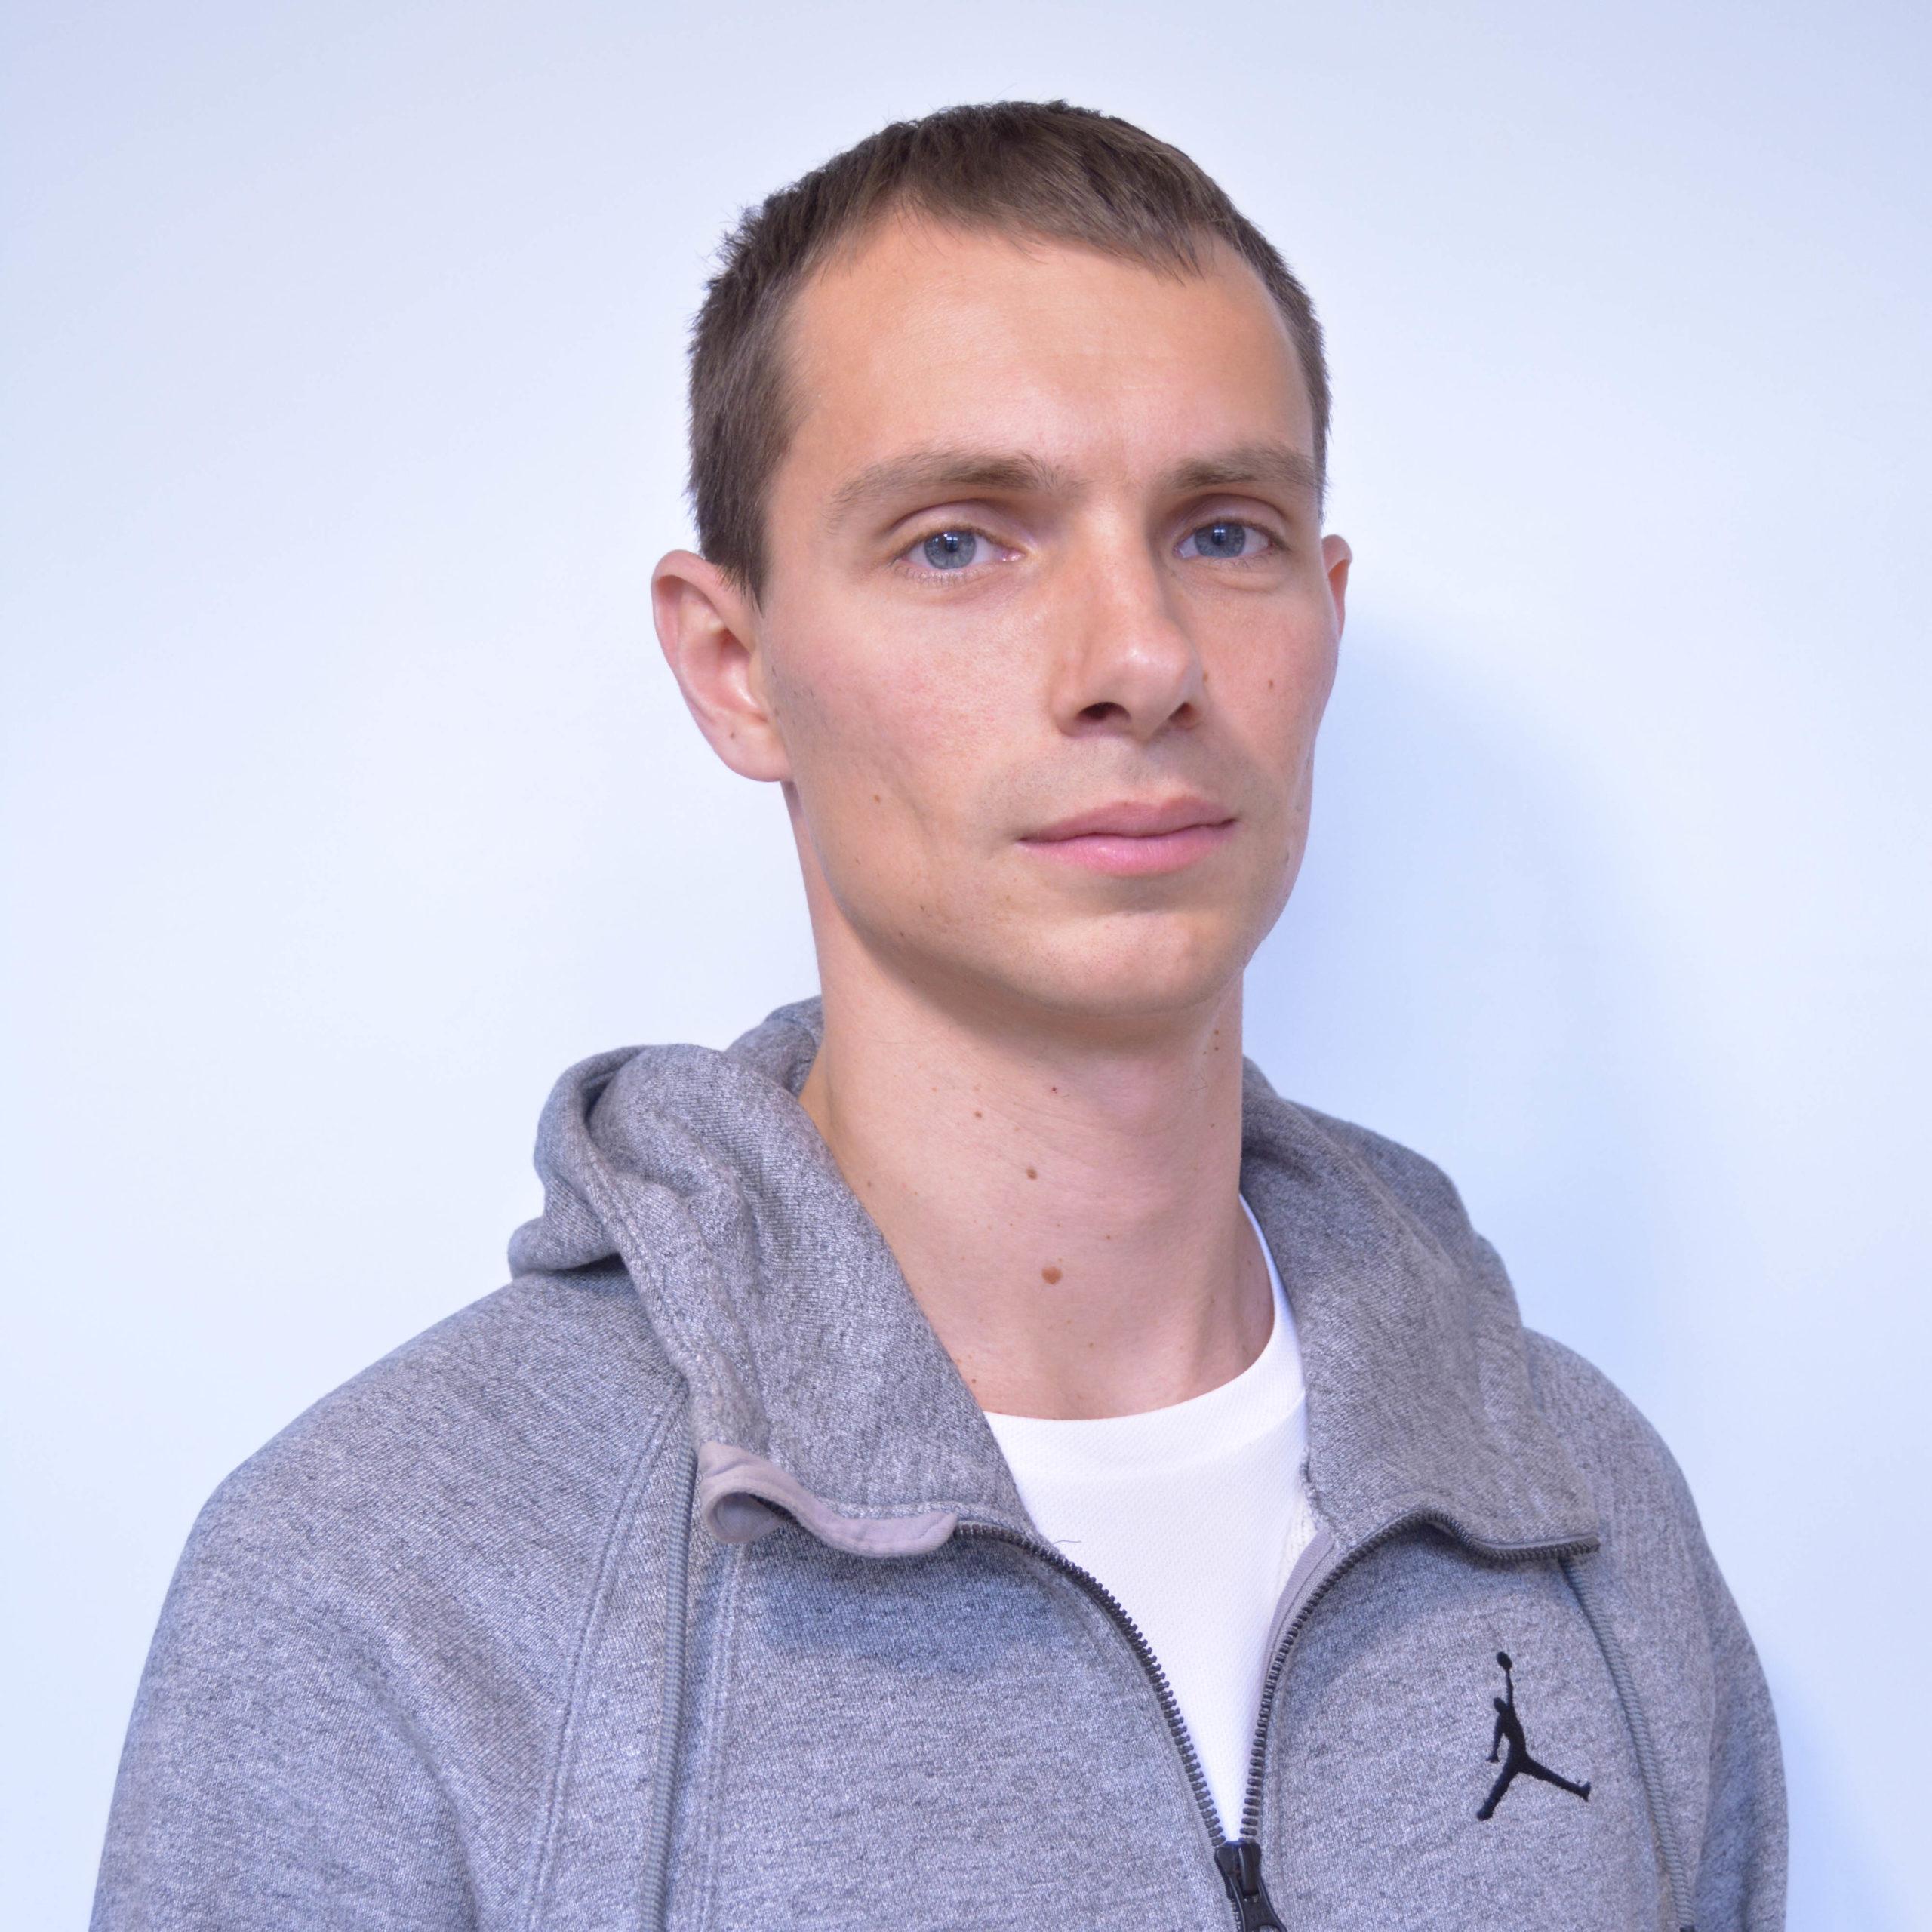 Несмелов Александр Алексеевич